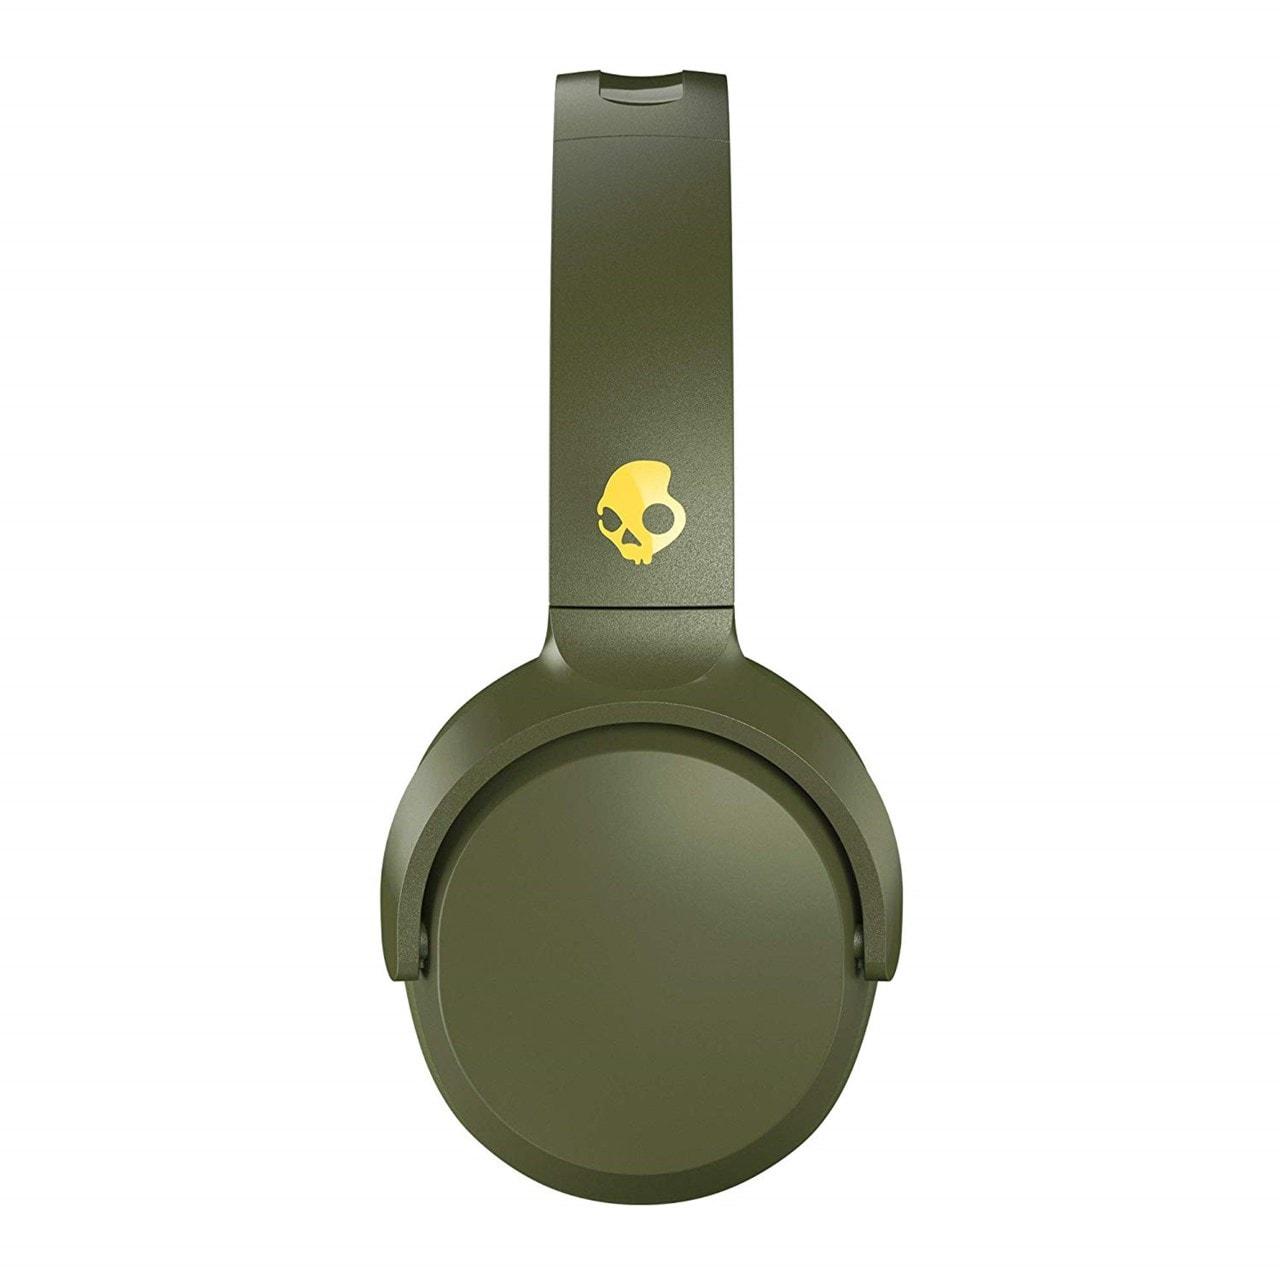 Skullcandy Riff Moss/Olive/Yellow Bluetooth Headphones - 3